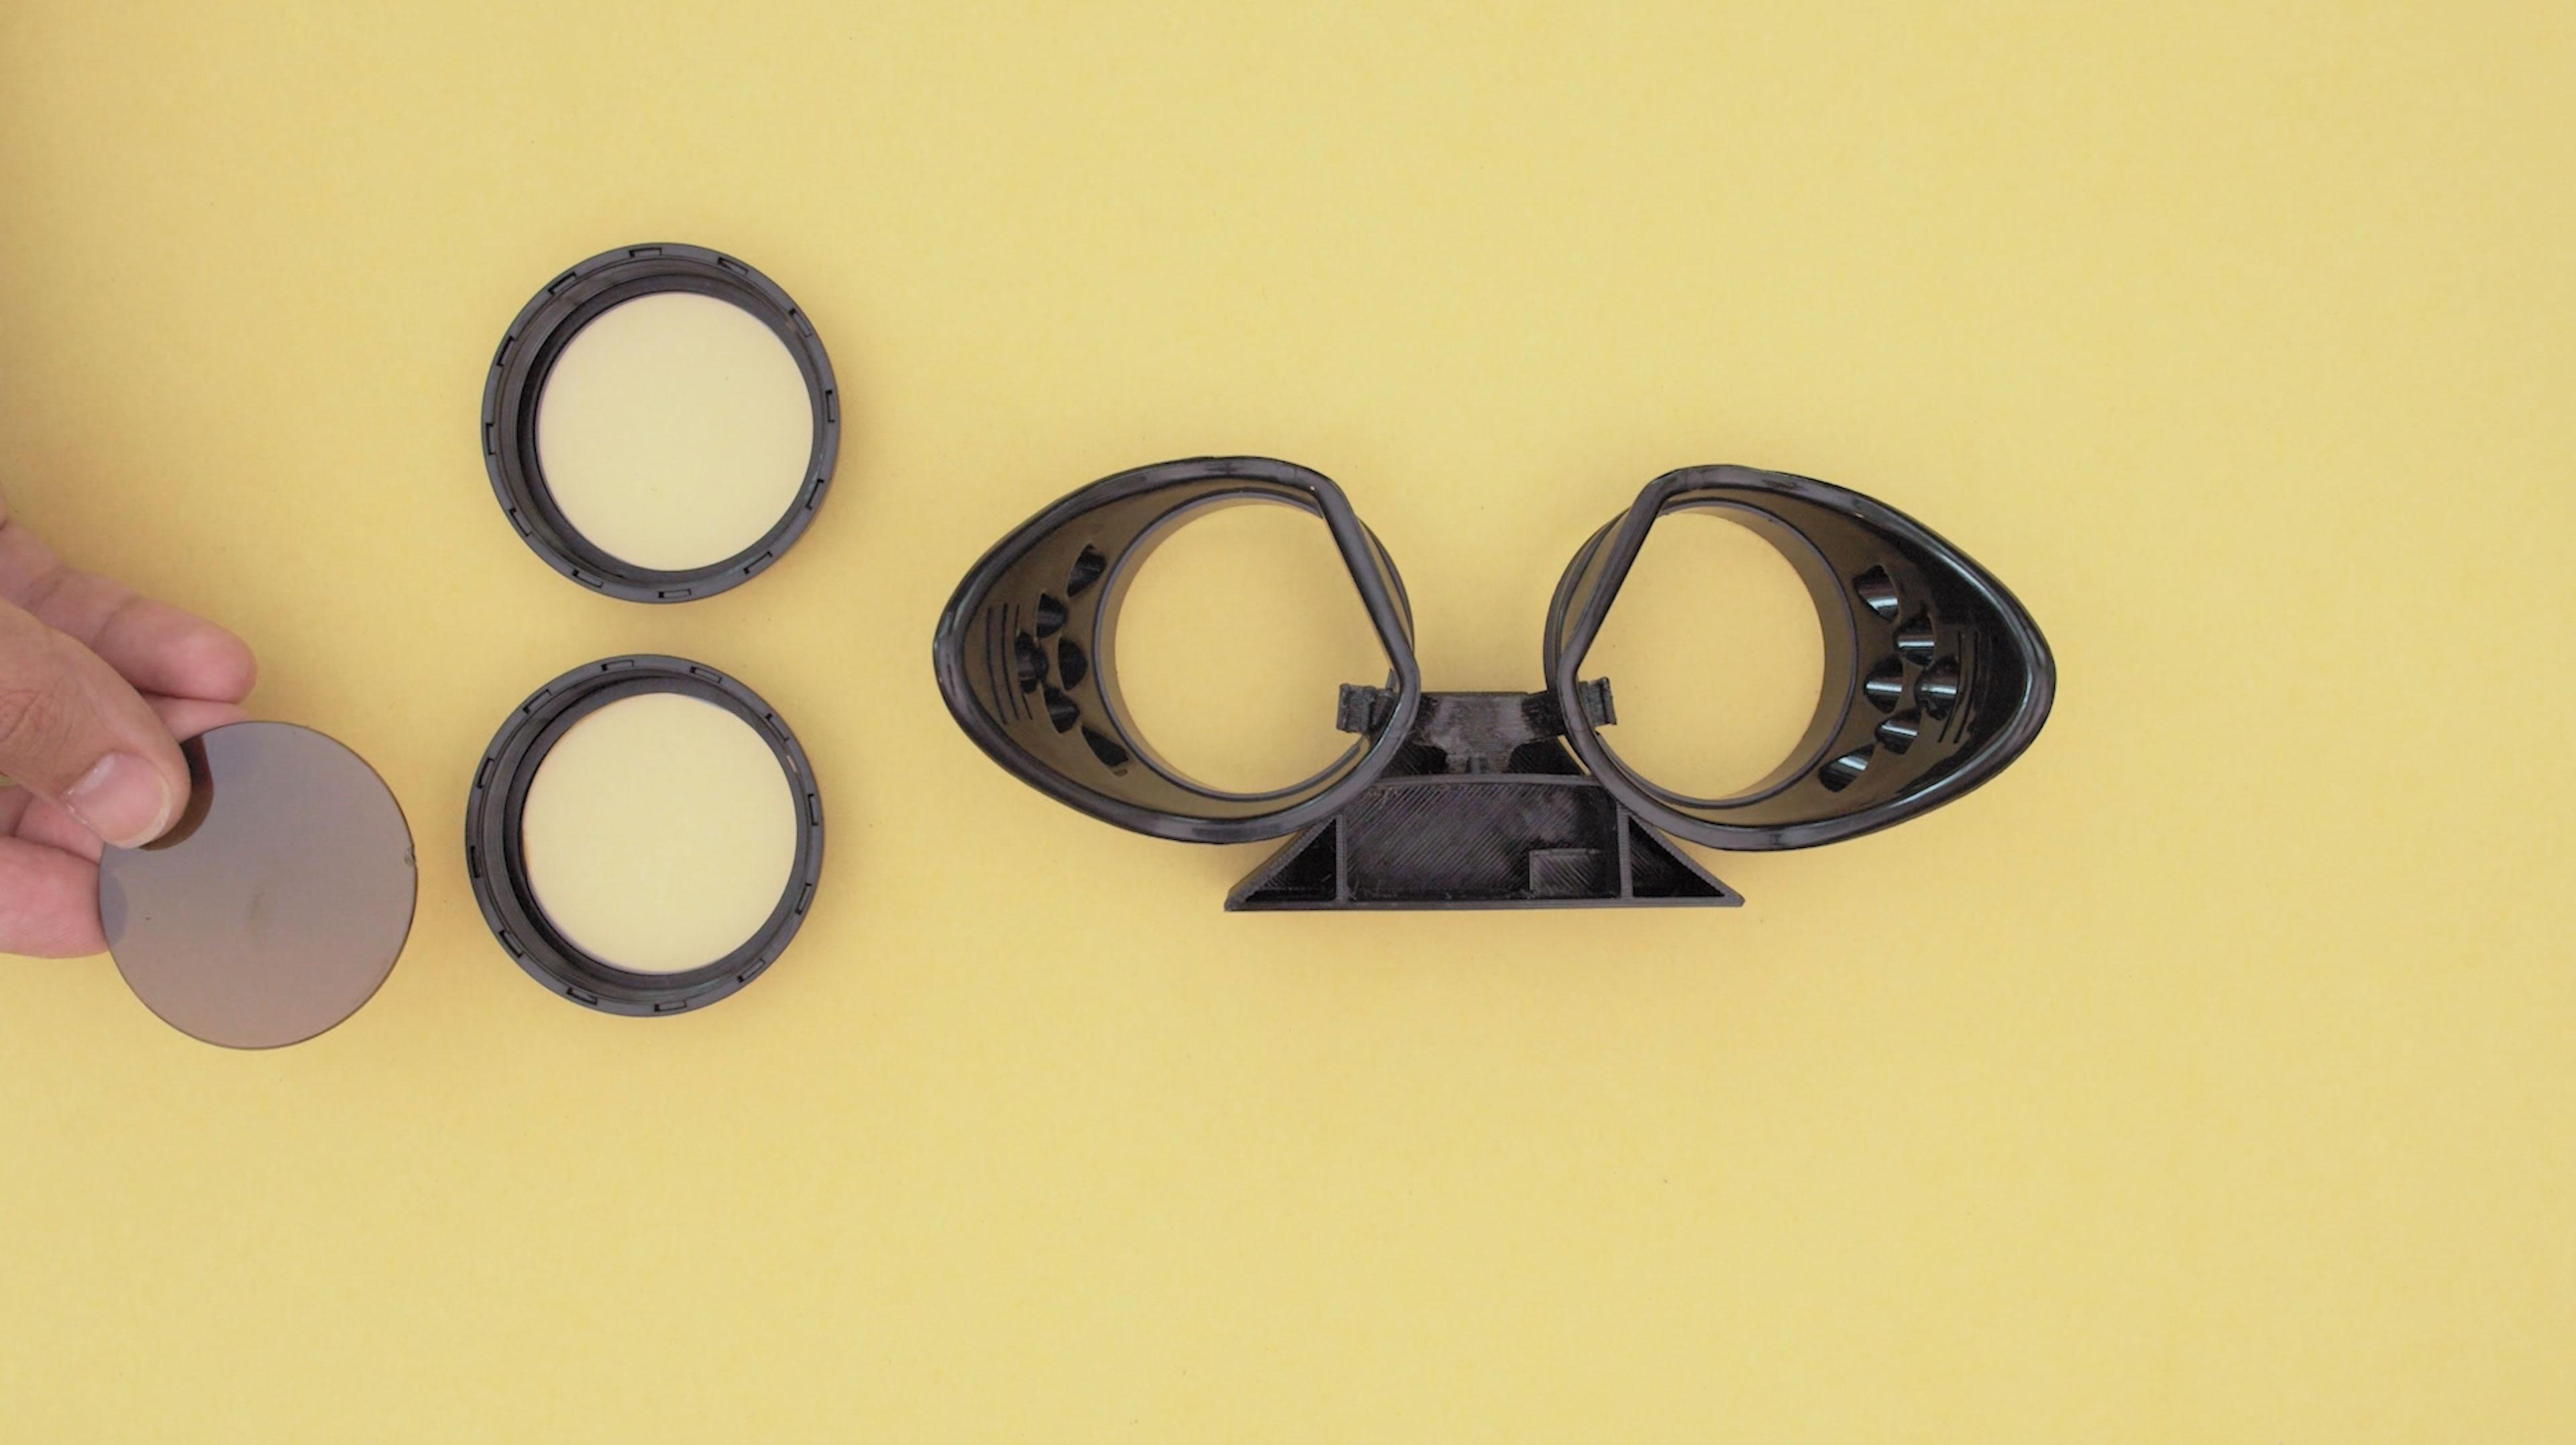 3d_printing_goggle-3dnose-lens-tint-remove.jpg